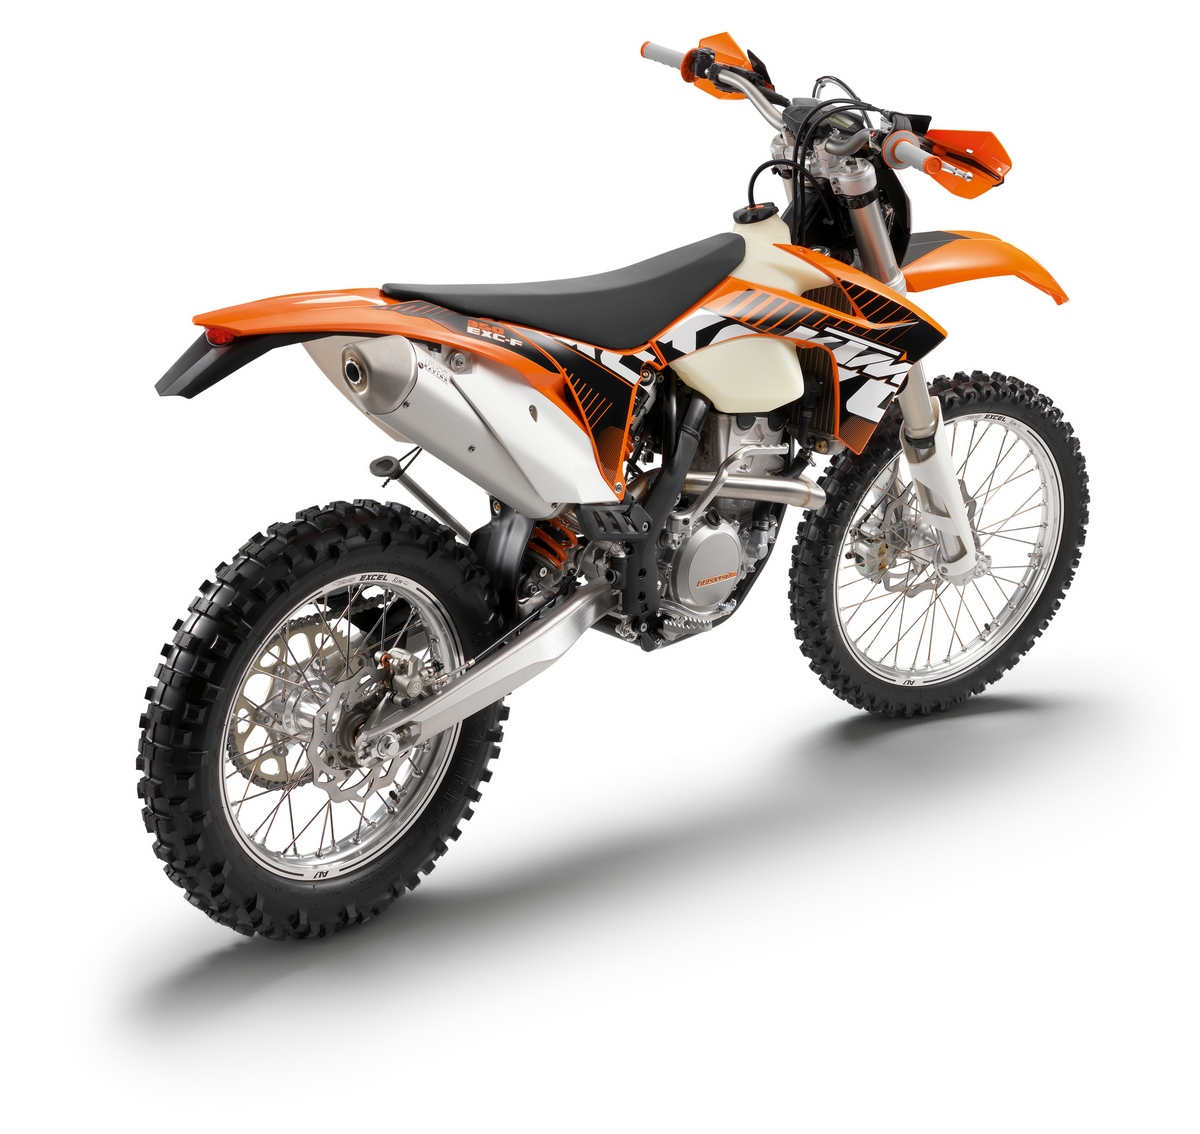 2012 KTM 350 EXC-F